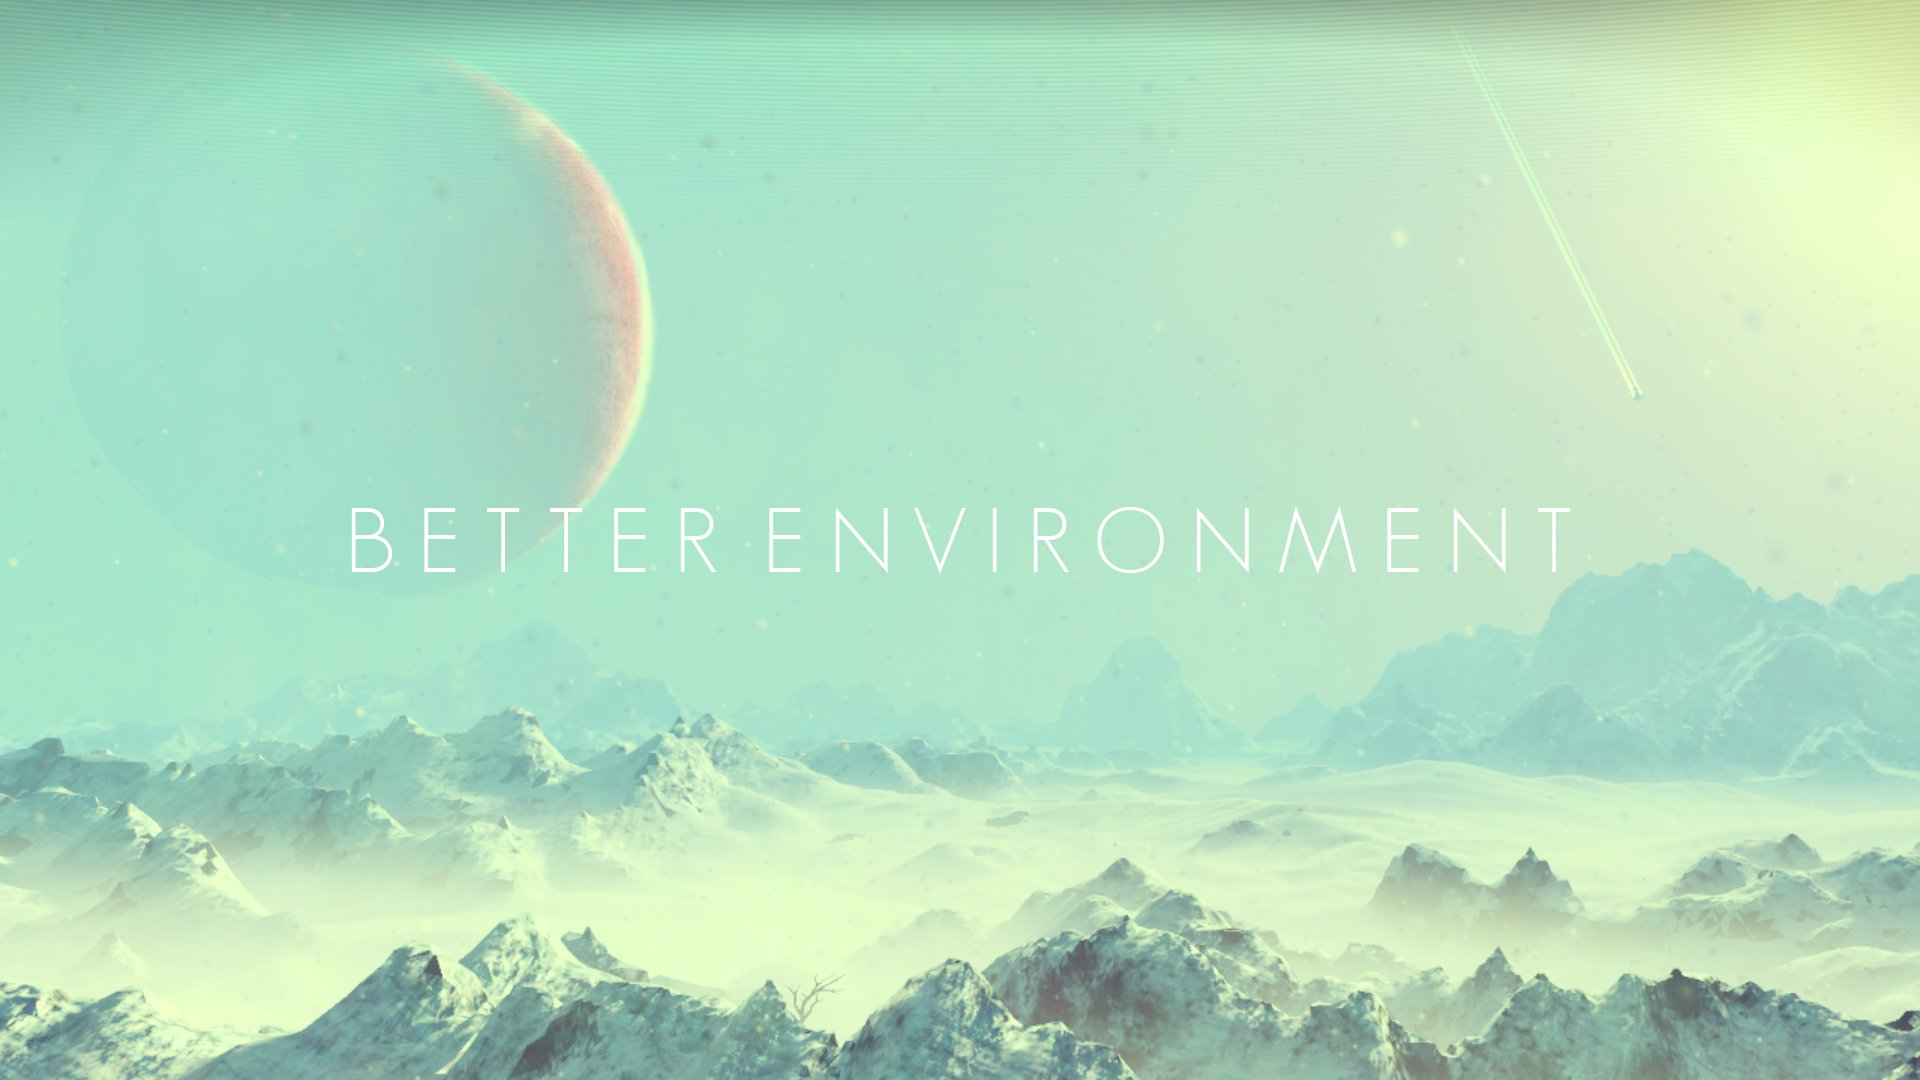 Better Environment